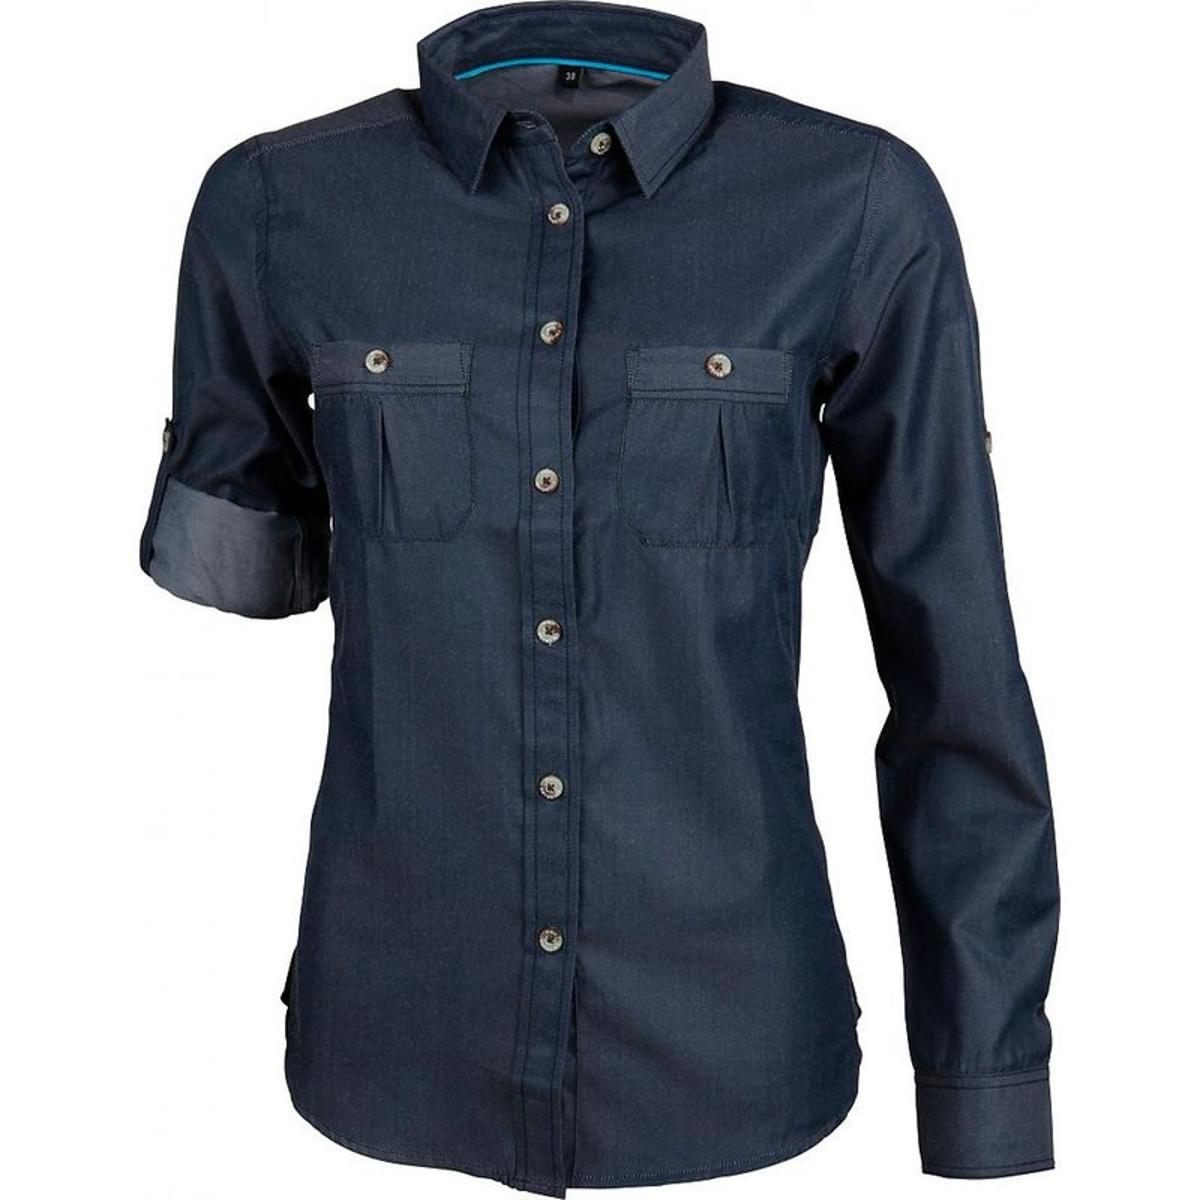 Taormina 2 - T-shirt manches longues Femme - bleu